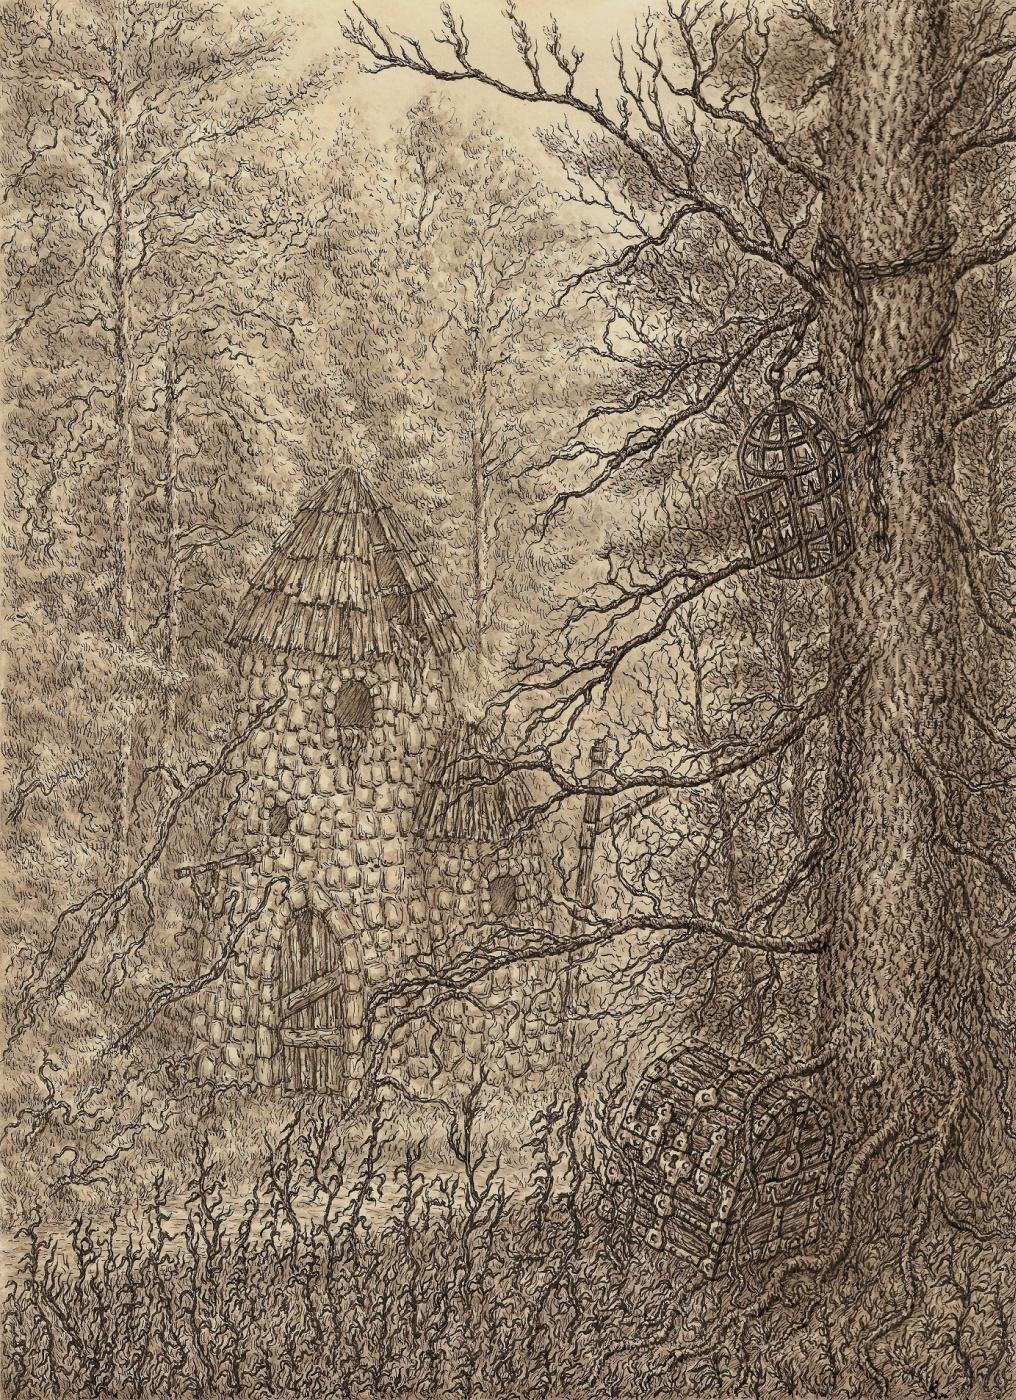 Vladimir Vladimirovich Khablovsky. Lost in the forest